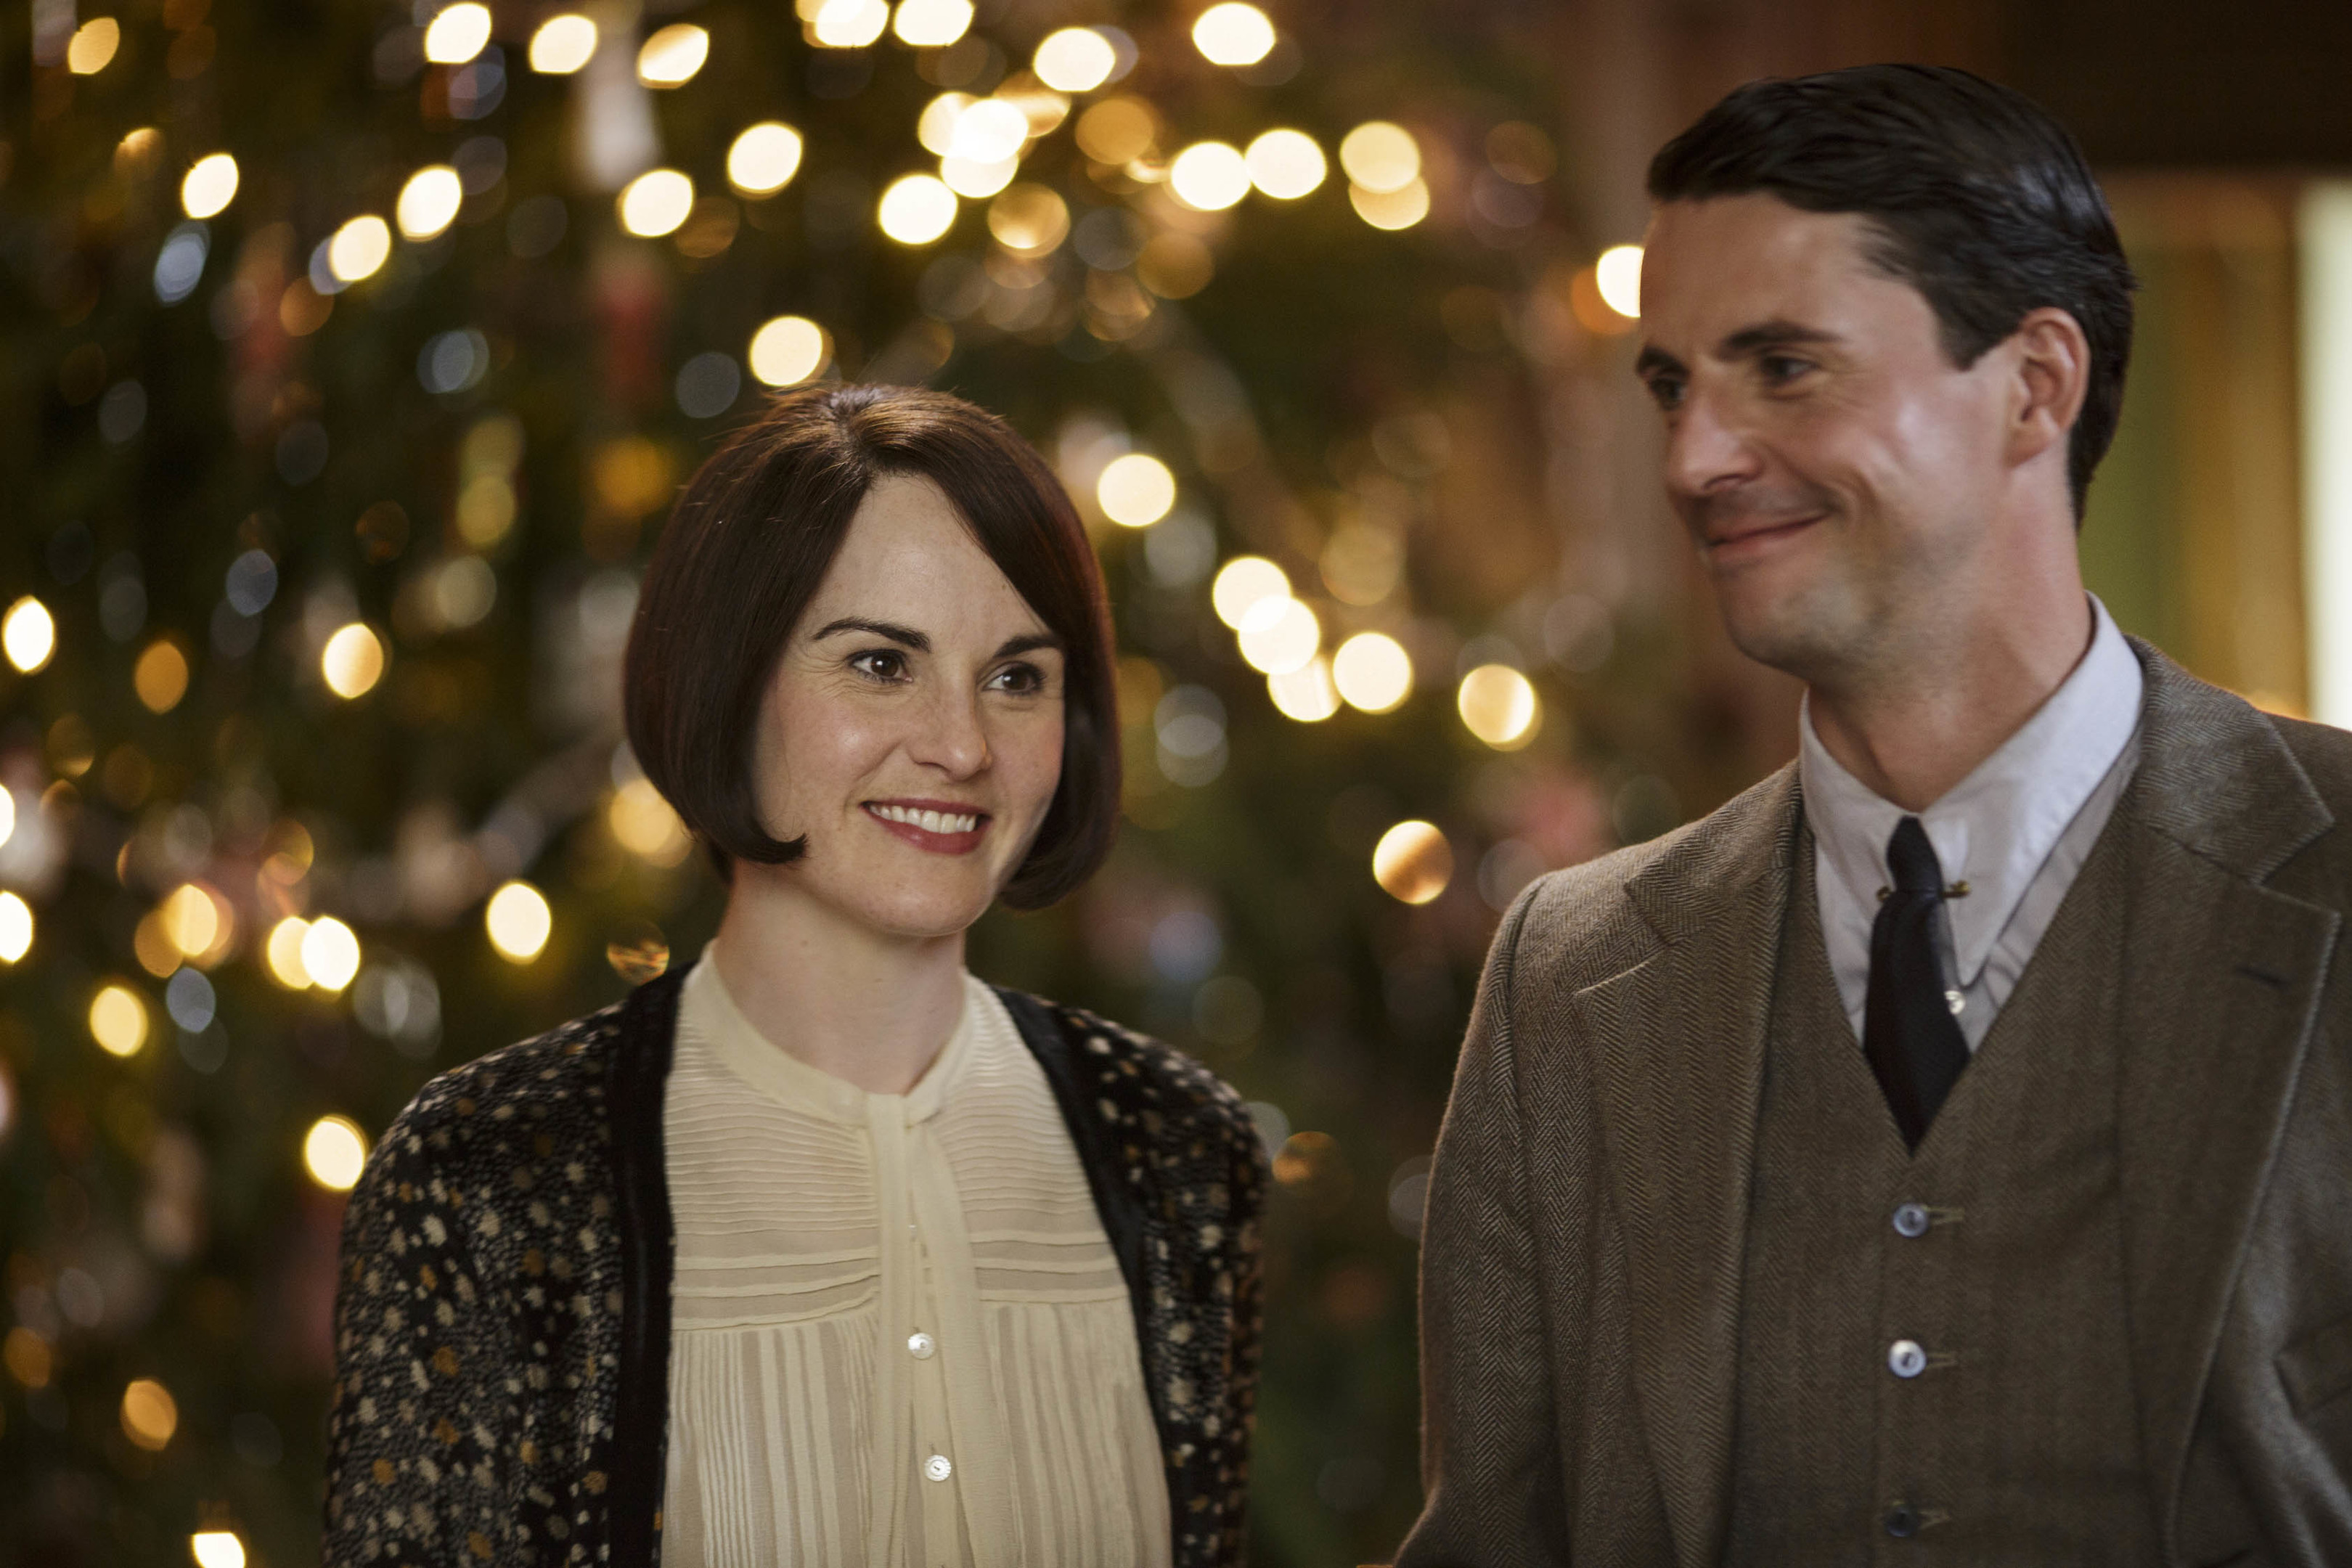 Downton Abbey | Christmas Final Episode 2015 (Carnival Films)